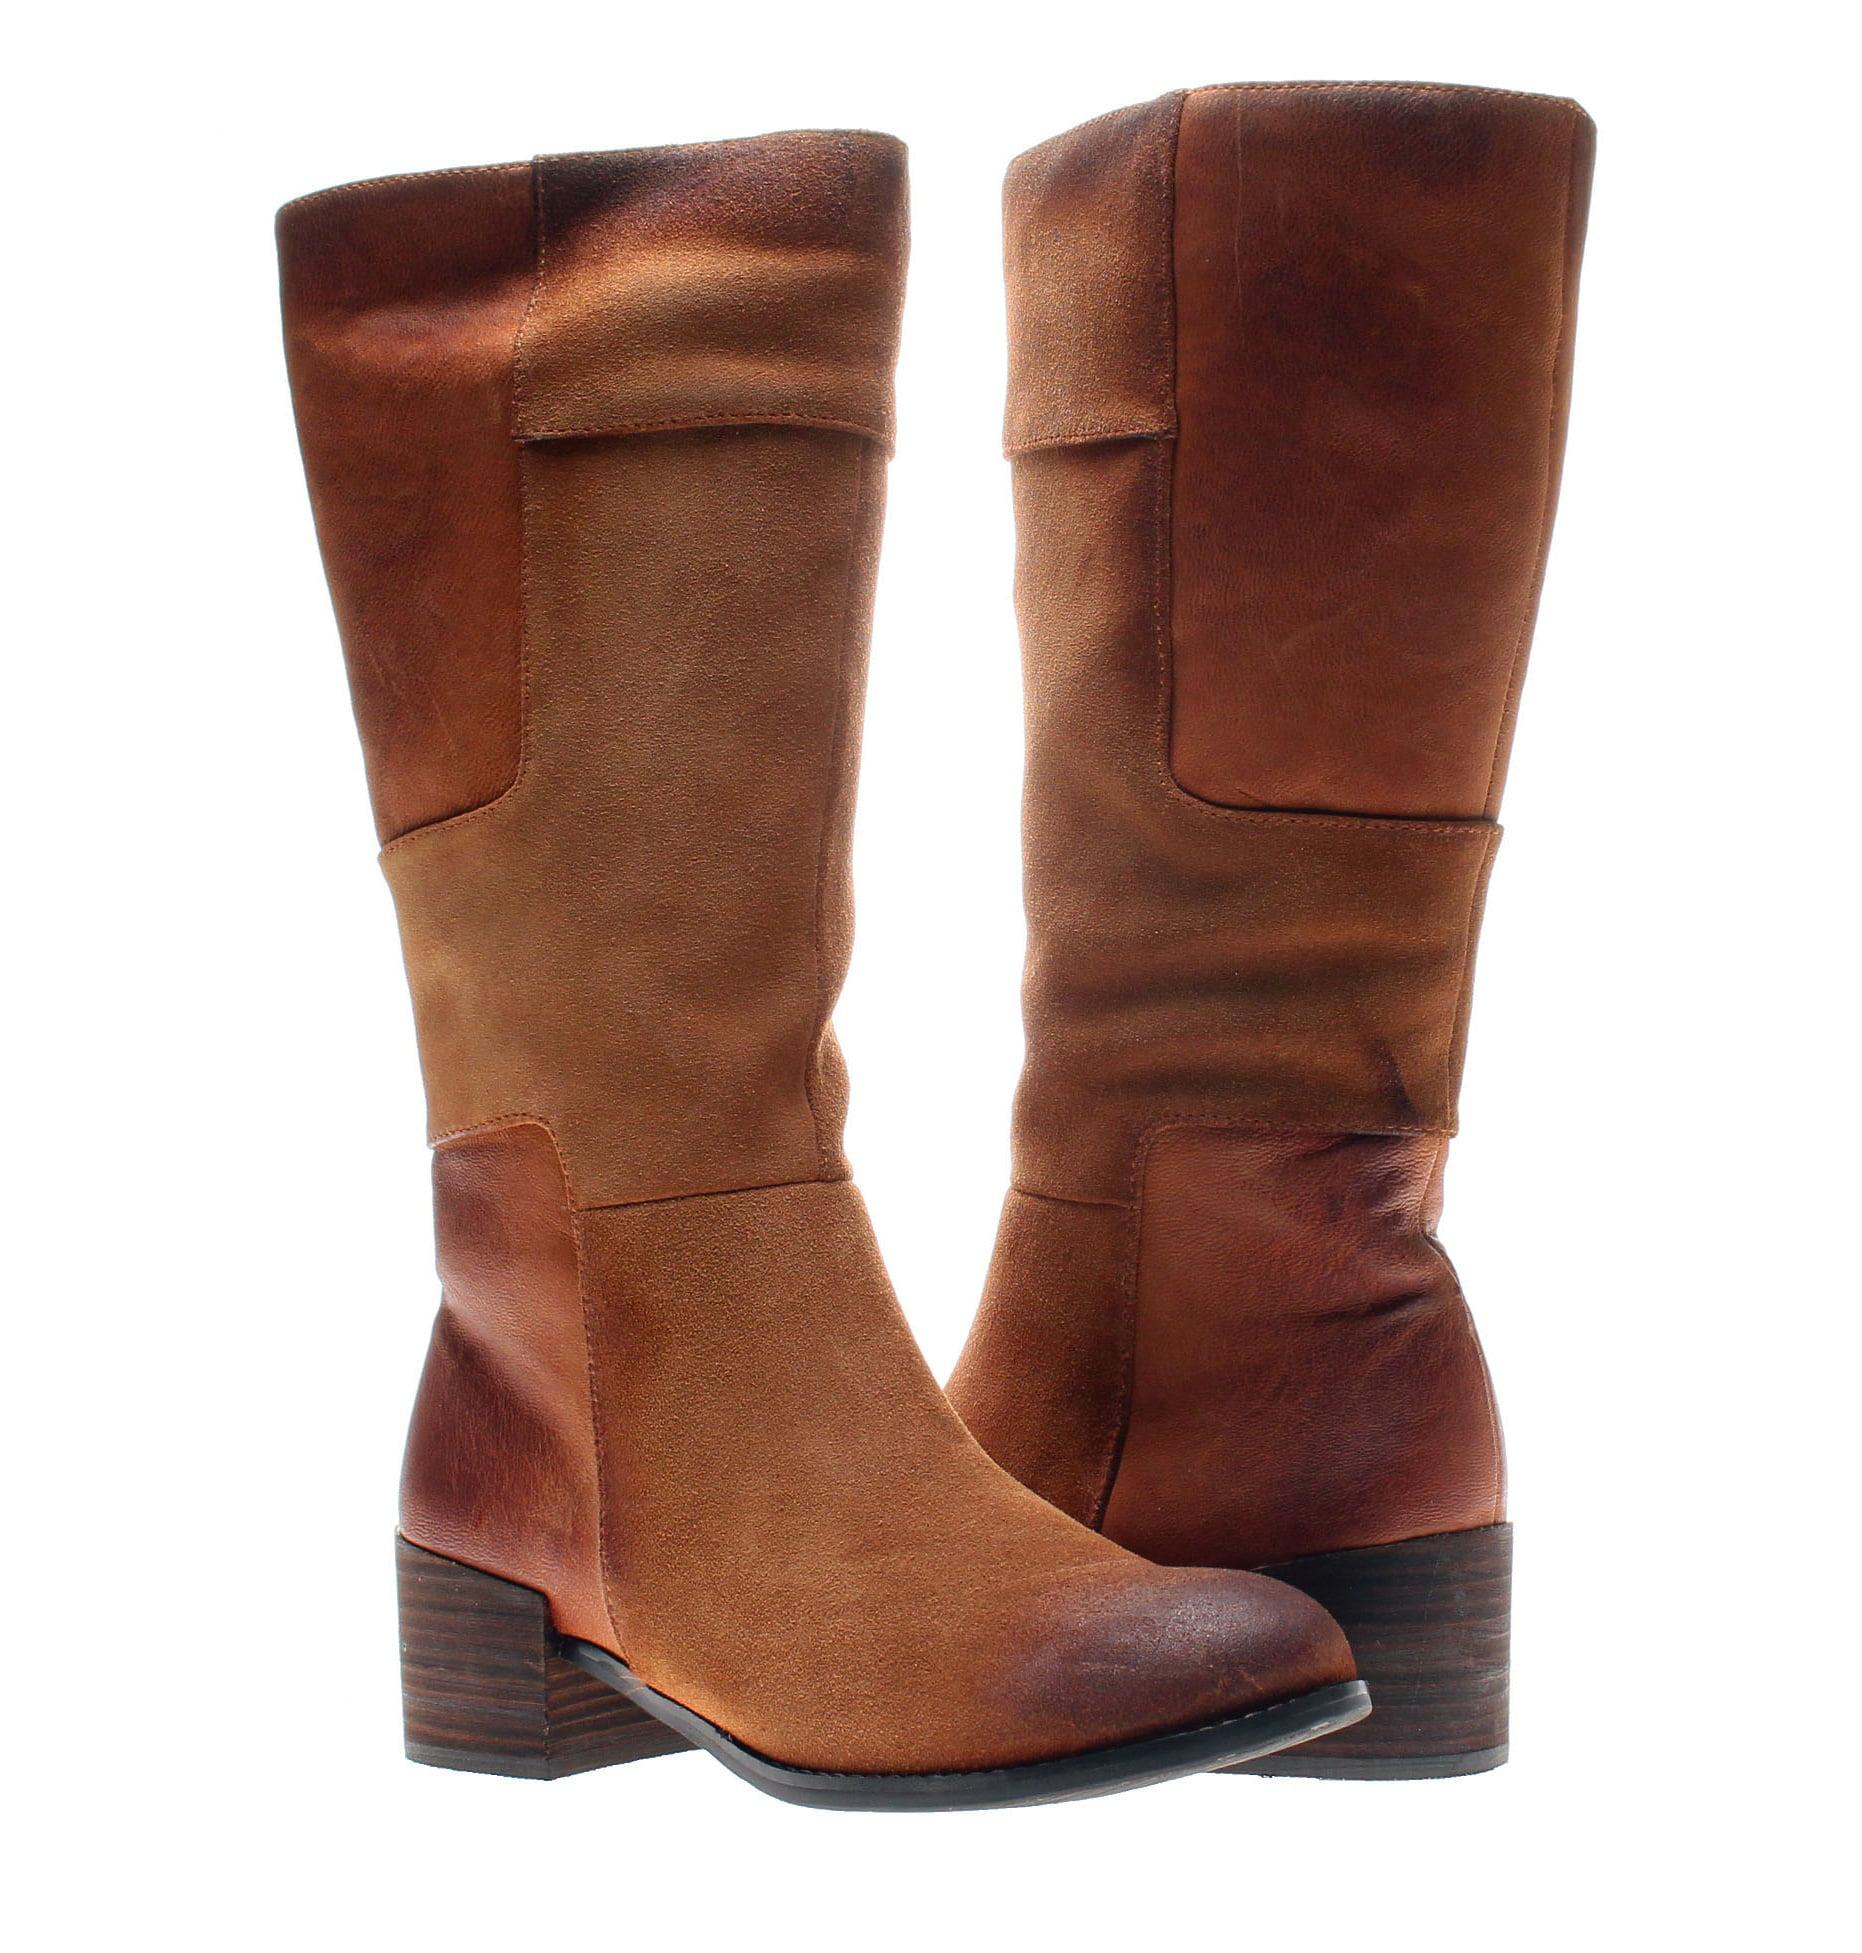 Antelope 355 Knee High Black Women/'s Boots 355-Black